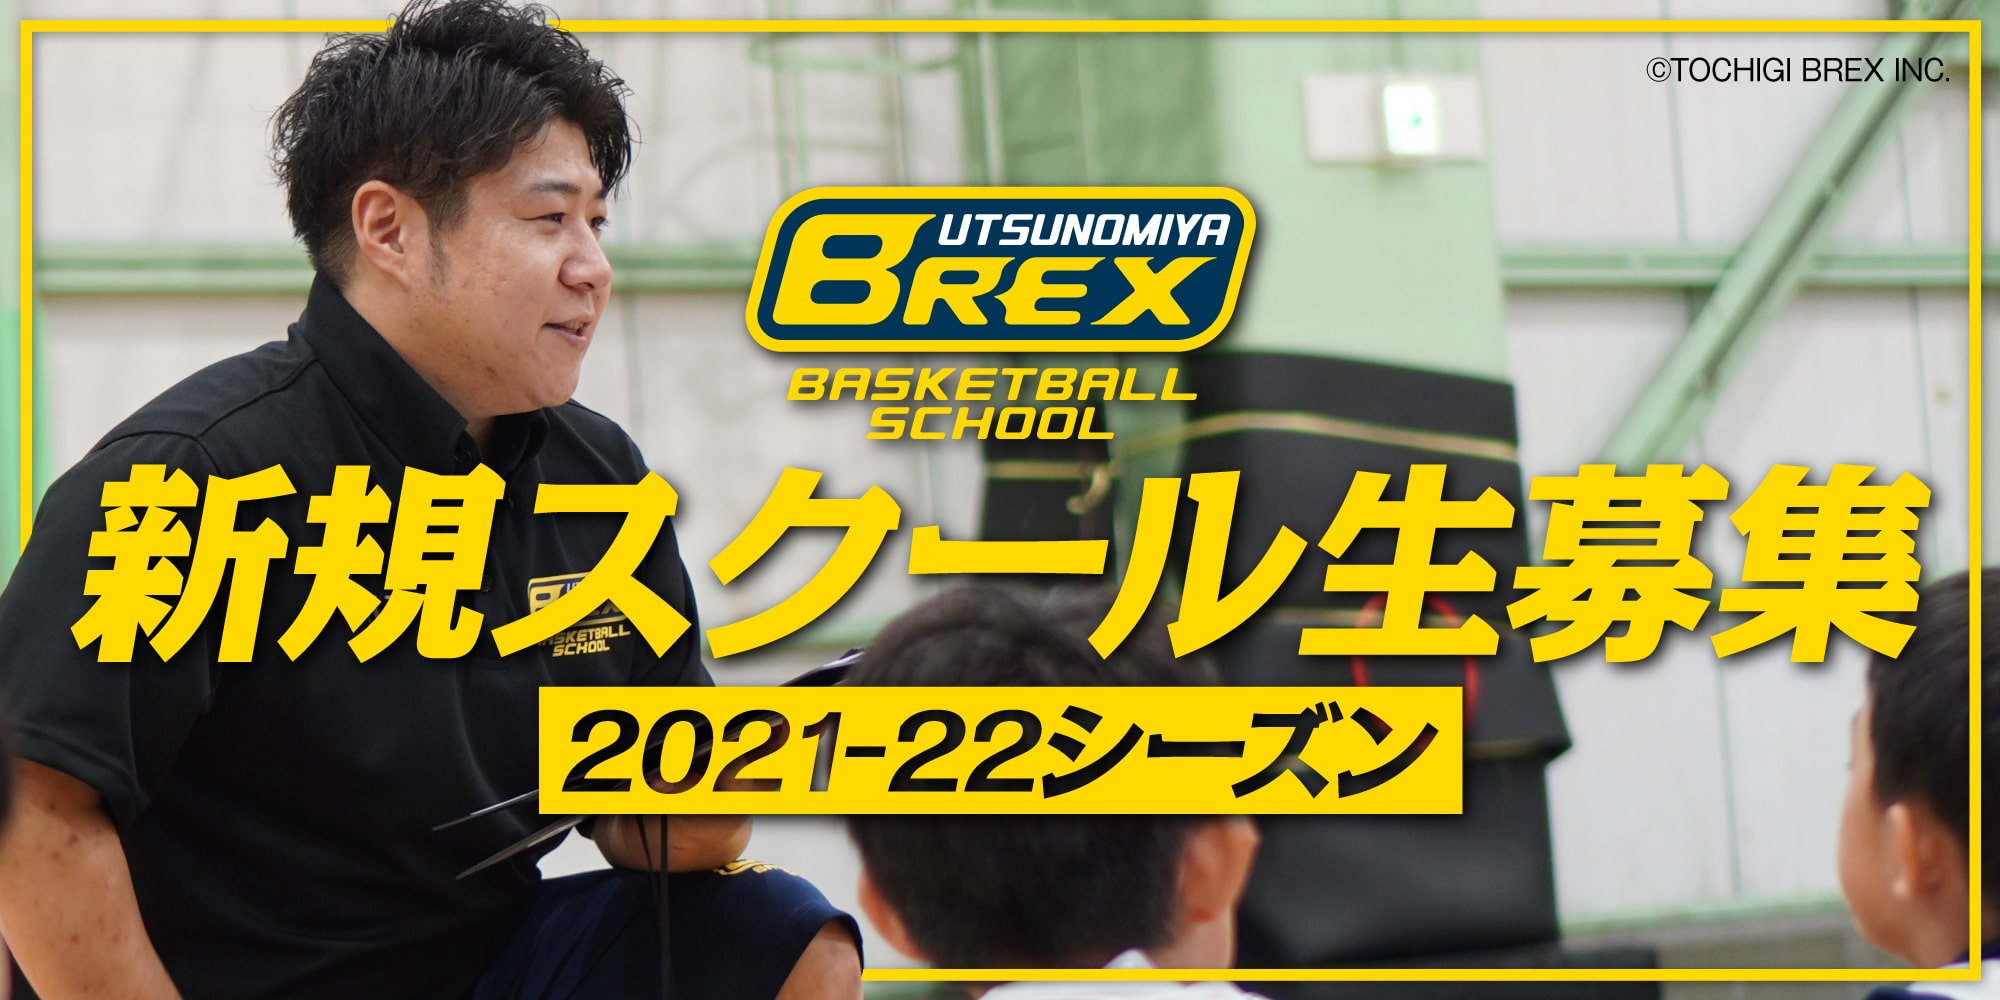 BREXバスケットボールスクール 2021-22シーズン 新規スクール生募集